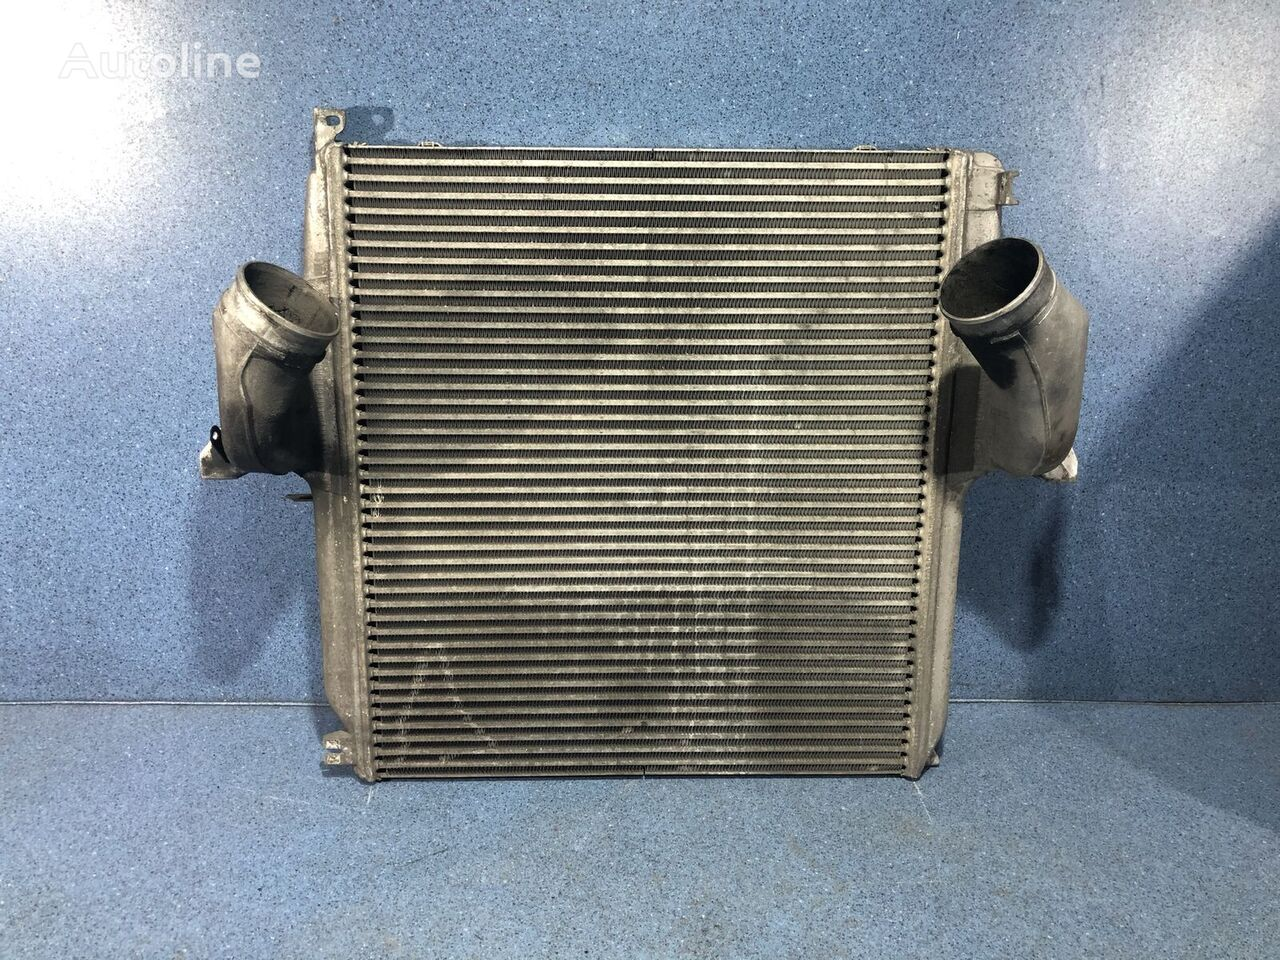 охлаждане на двигателя радиатора  Интеркулер за камион